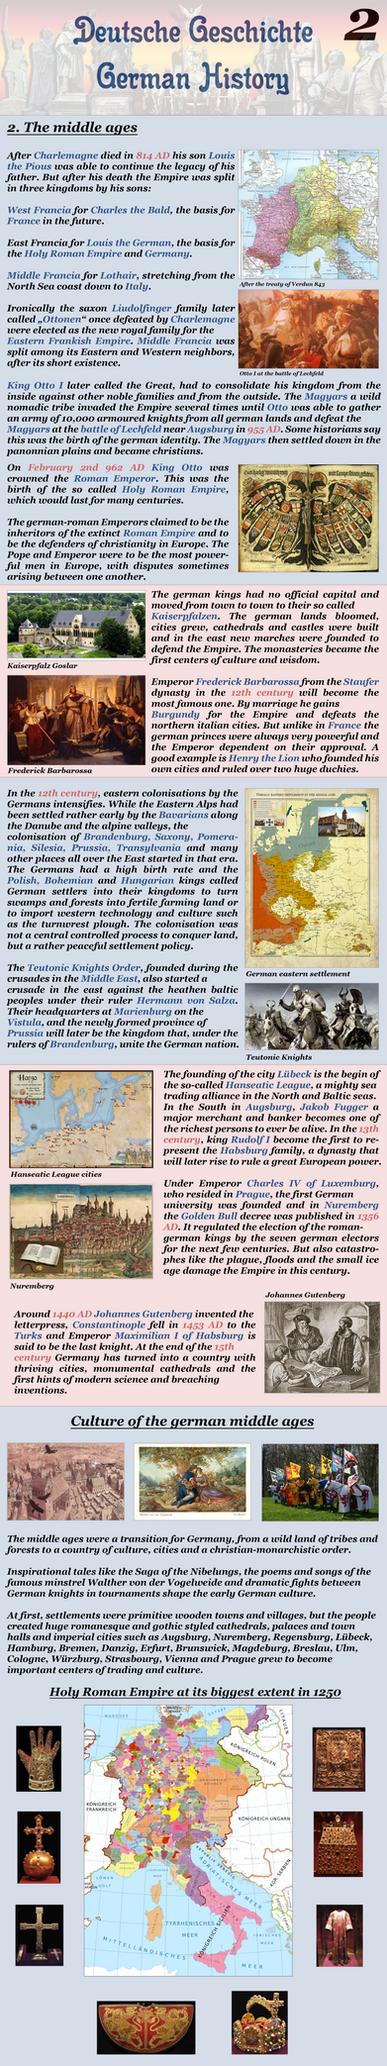 German history part 2 by Arminius1871